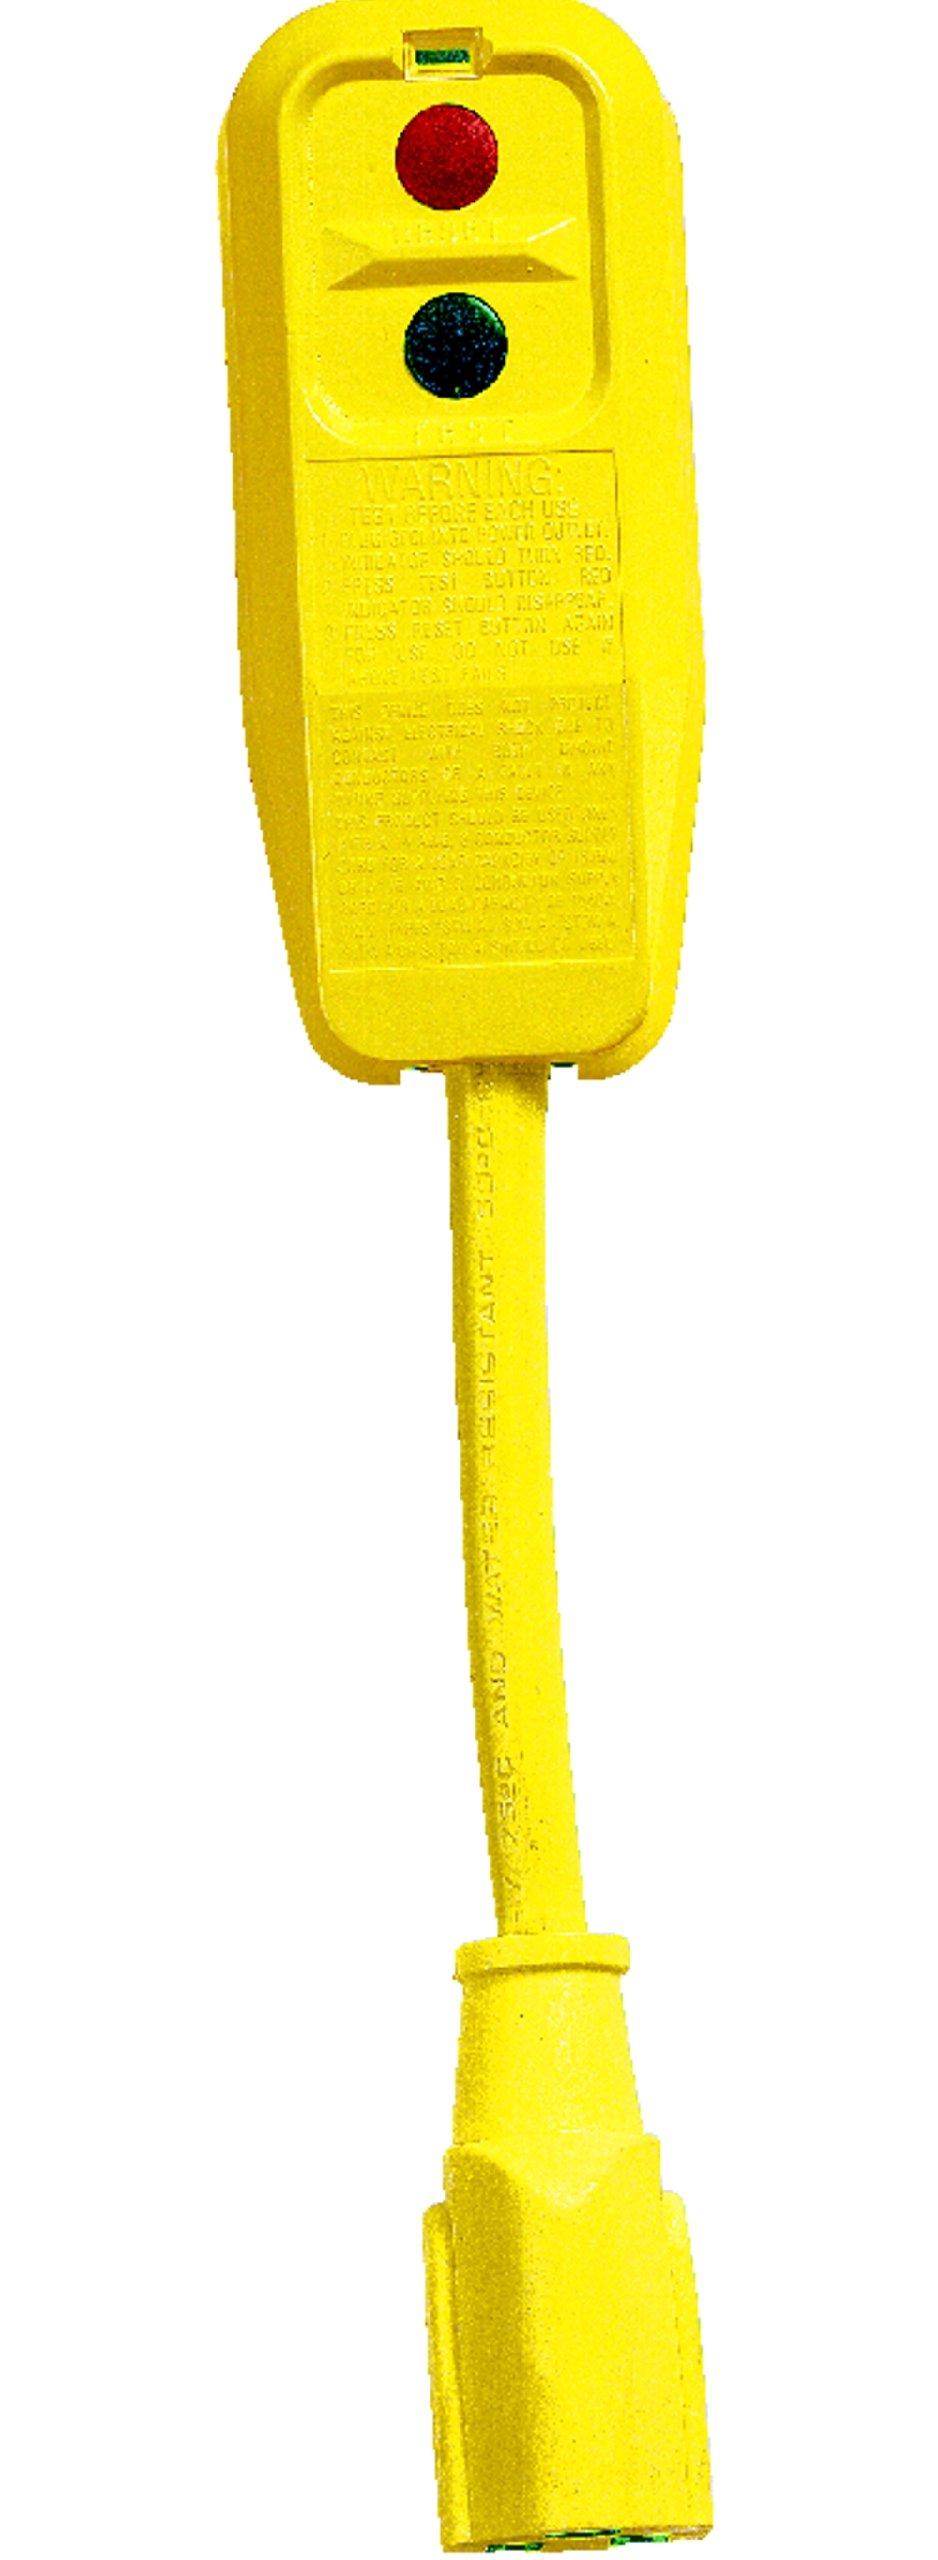 Lind Equipment 14880-4001 GFCI plug and cord set, 120V/15A, 9'' 14/3 cable